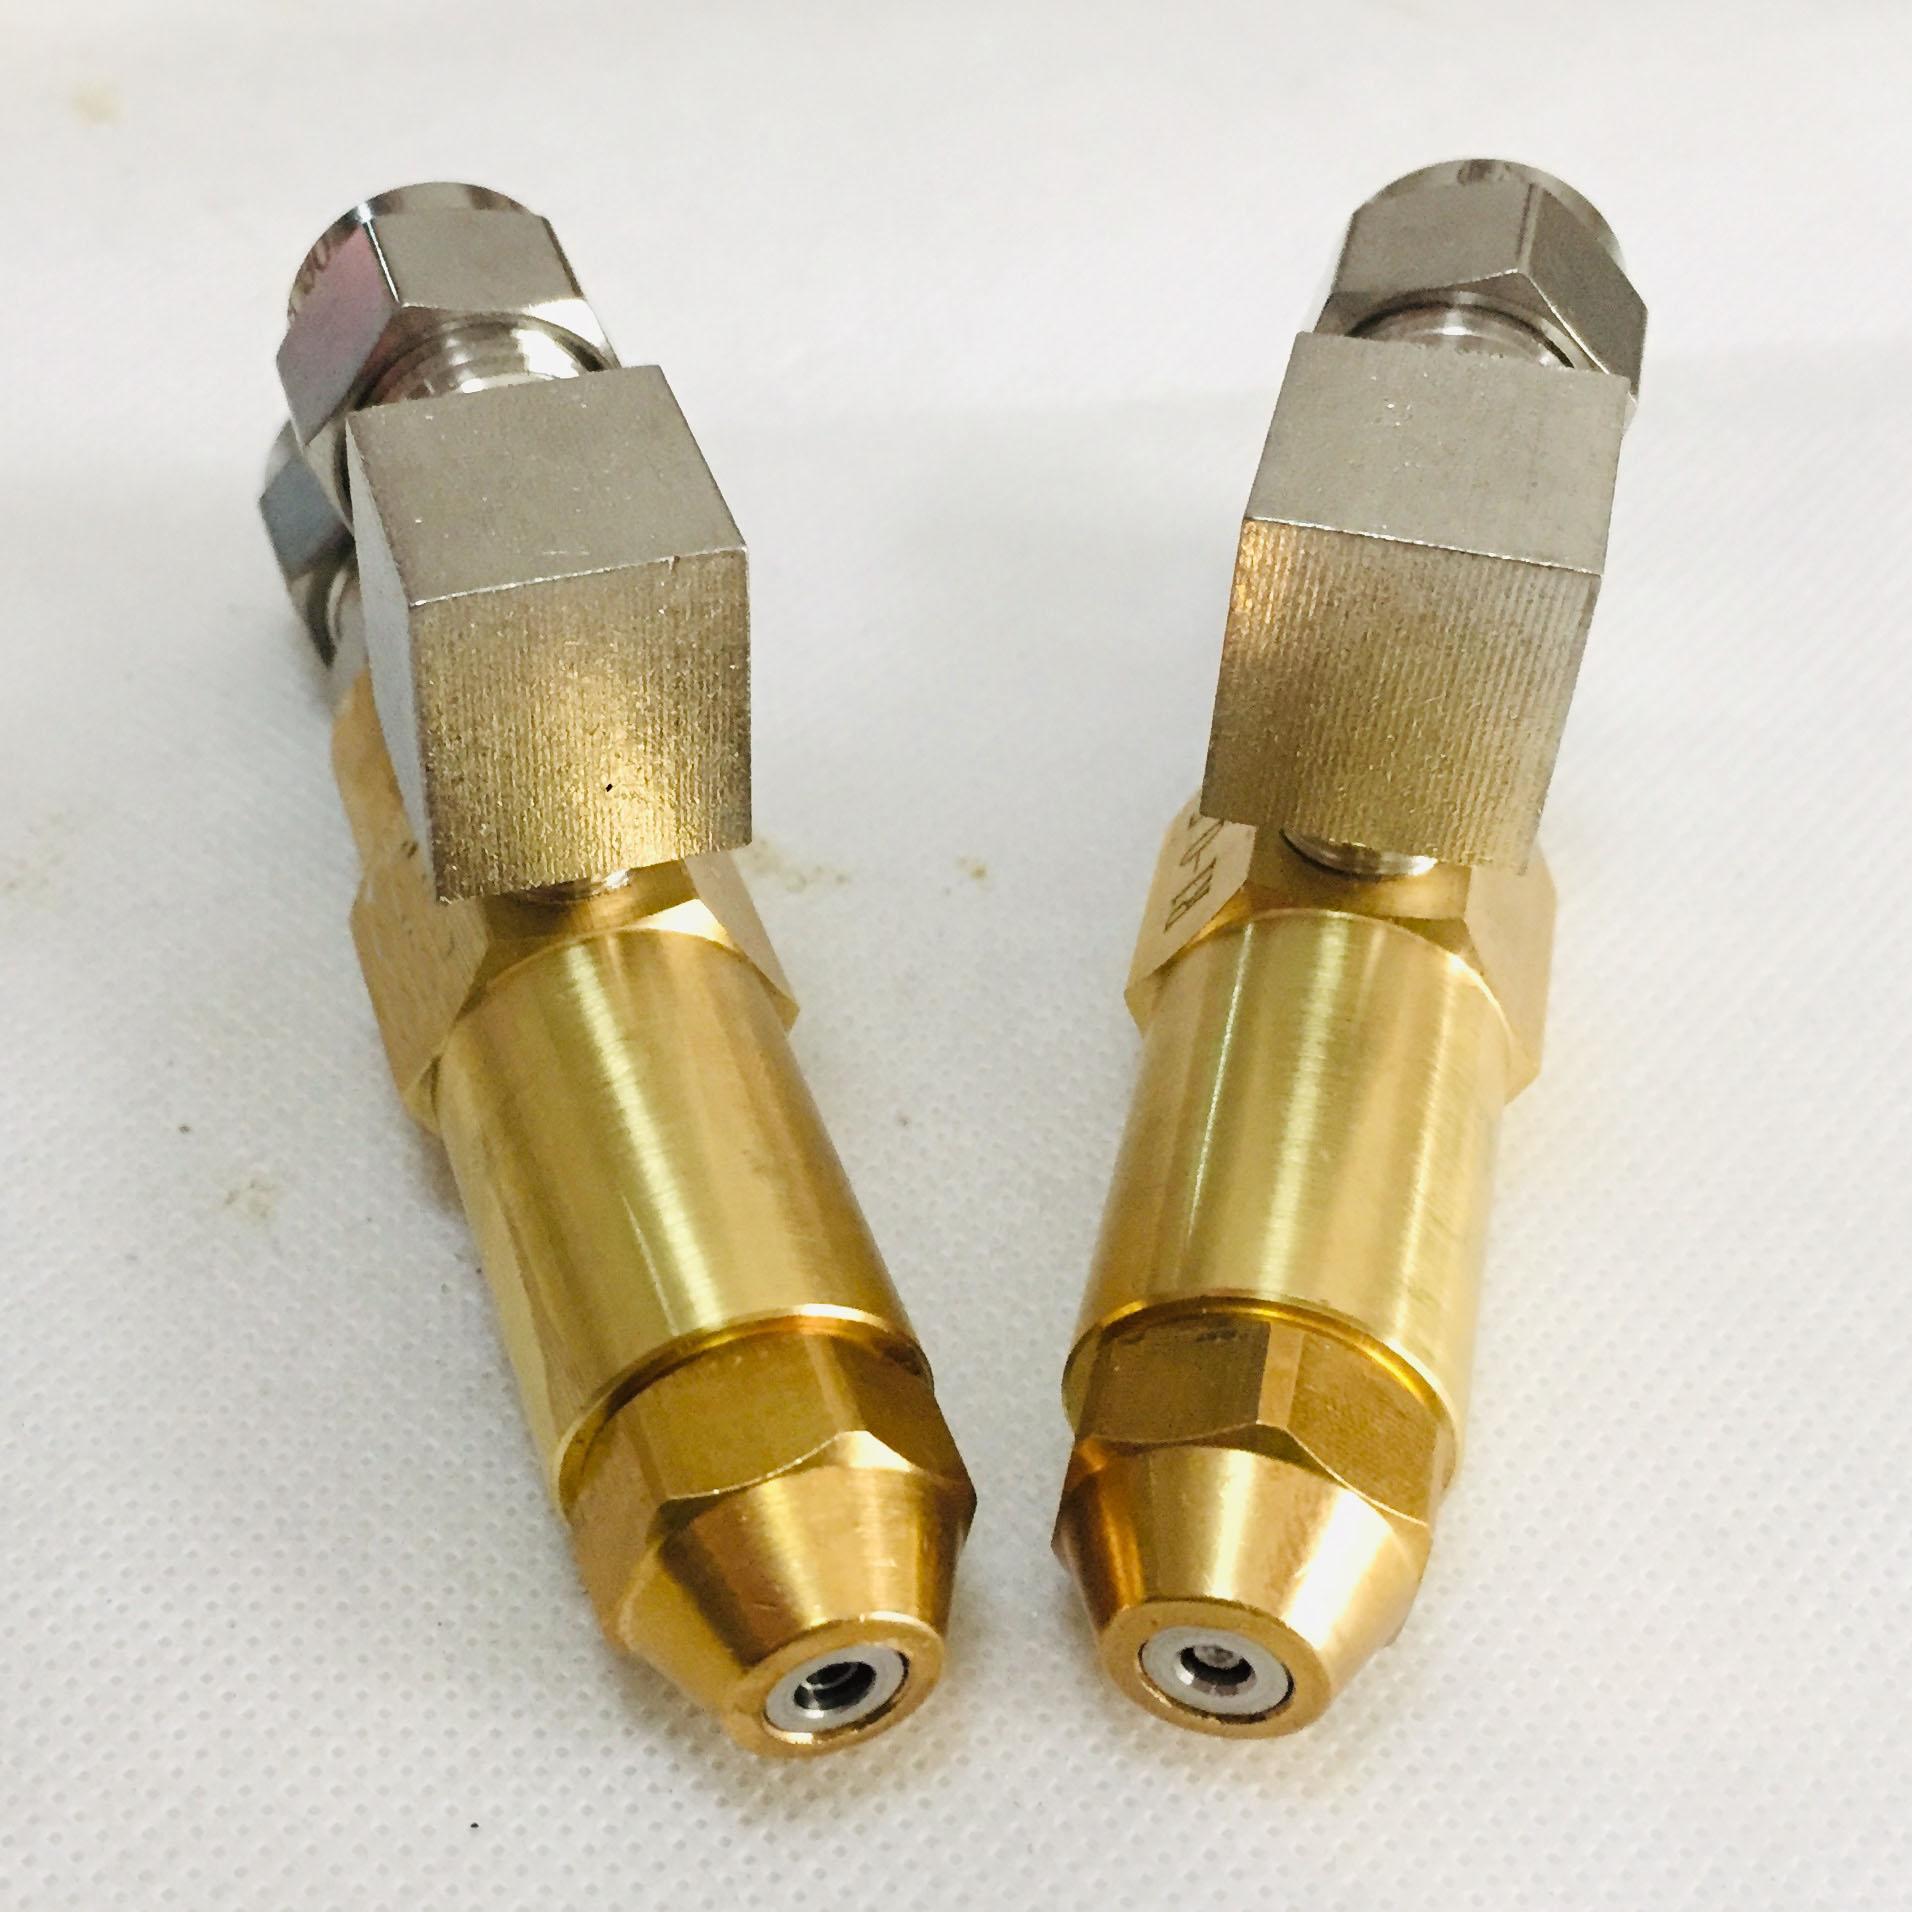 Image 2 - 68mm 0.5/0.8/1.0/1.2/1.5/2.0/2.5/3.0mm Waste oil burner  nozzle,air atomizing nozzle,fuel oil nozzle,full cone oil spray  nozzleSprayers